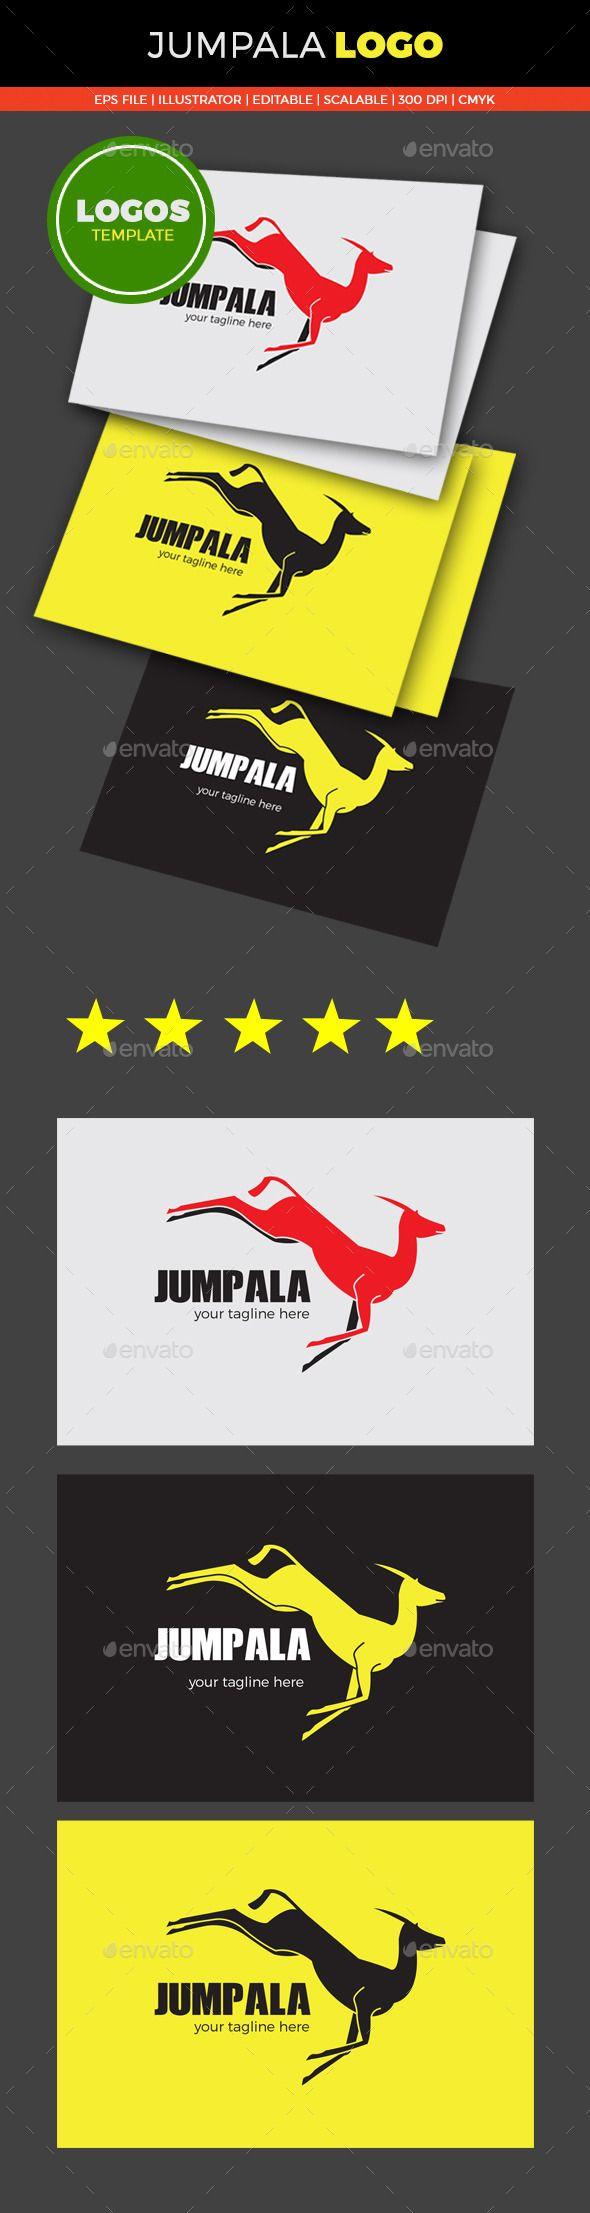 Jumpala Logo Template